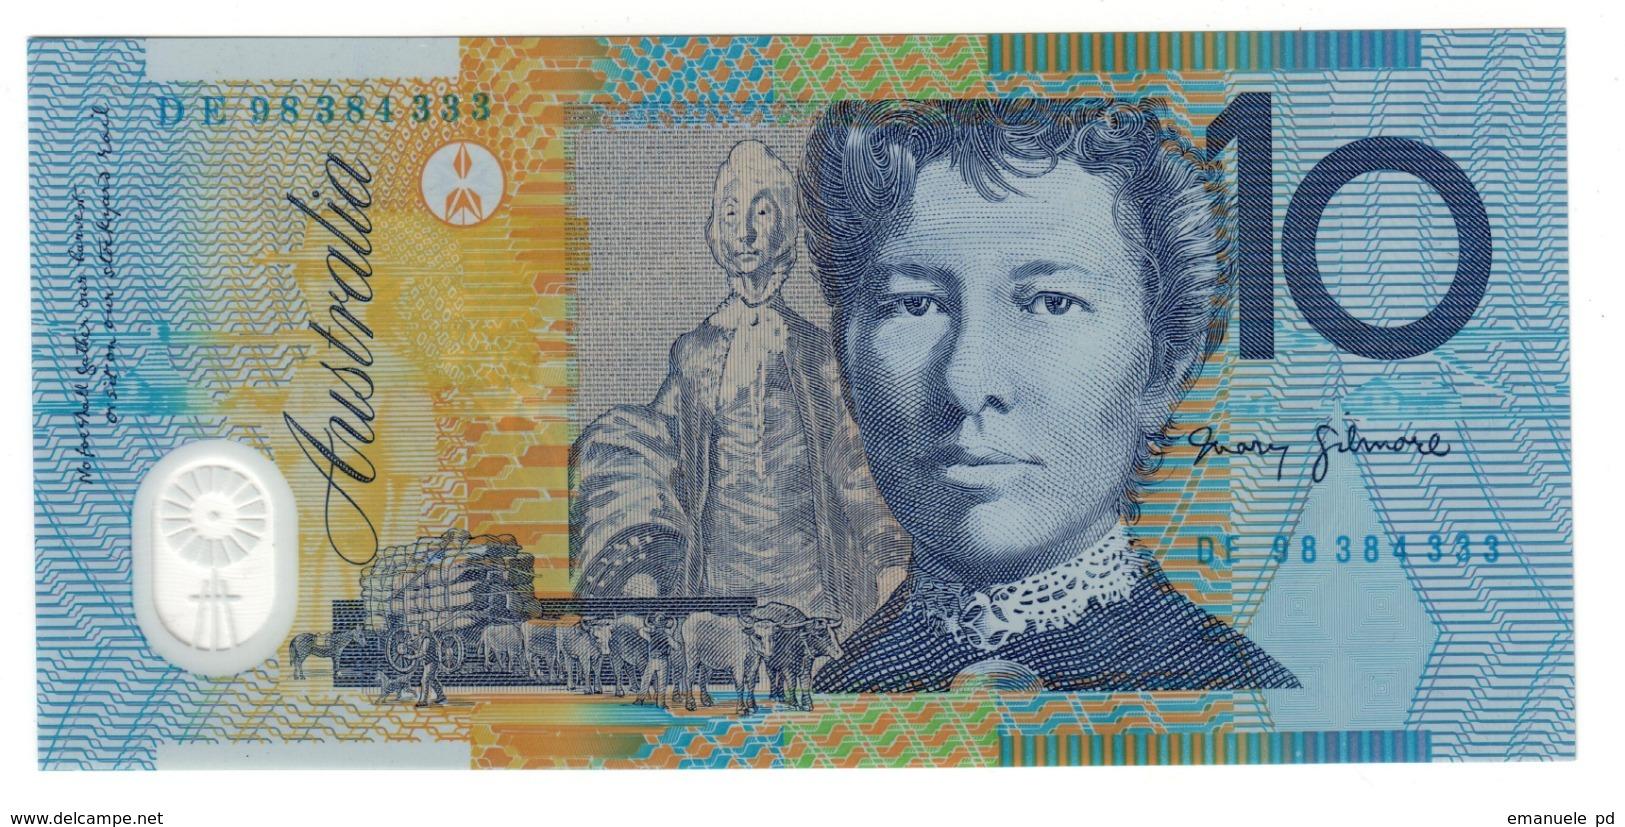 Australia 10 Dollars 1998 UNC .PL. - 1992-2001 (Polymer)